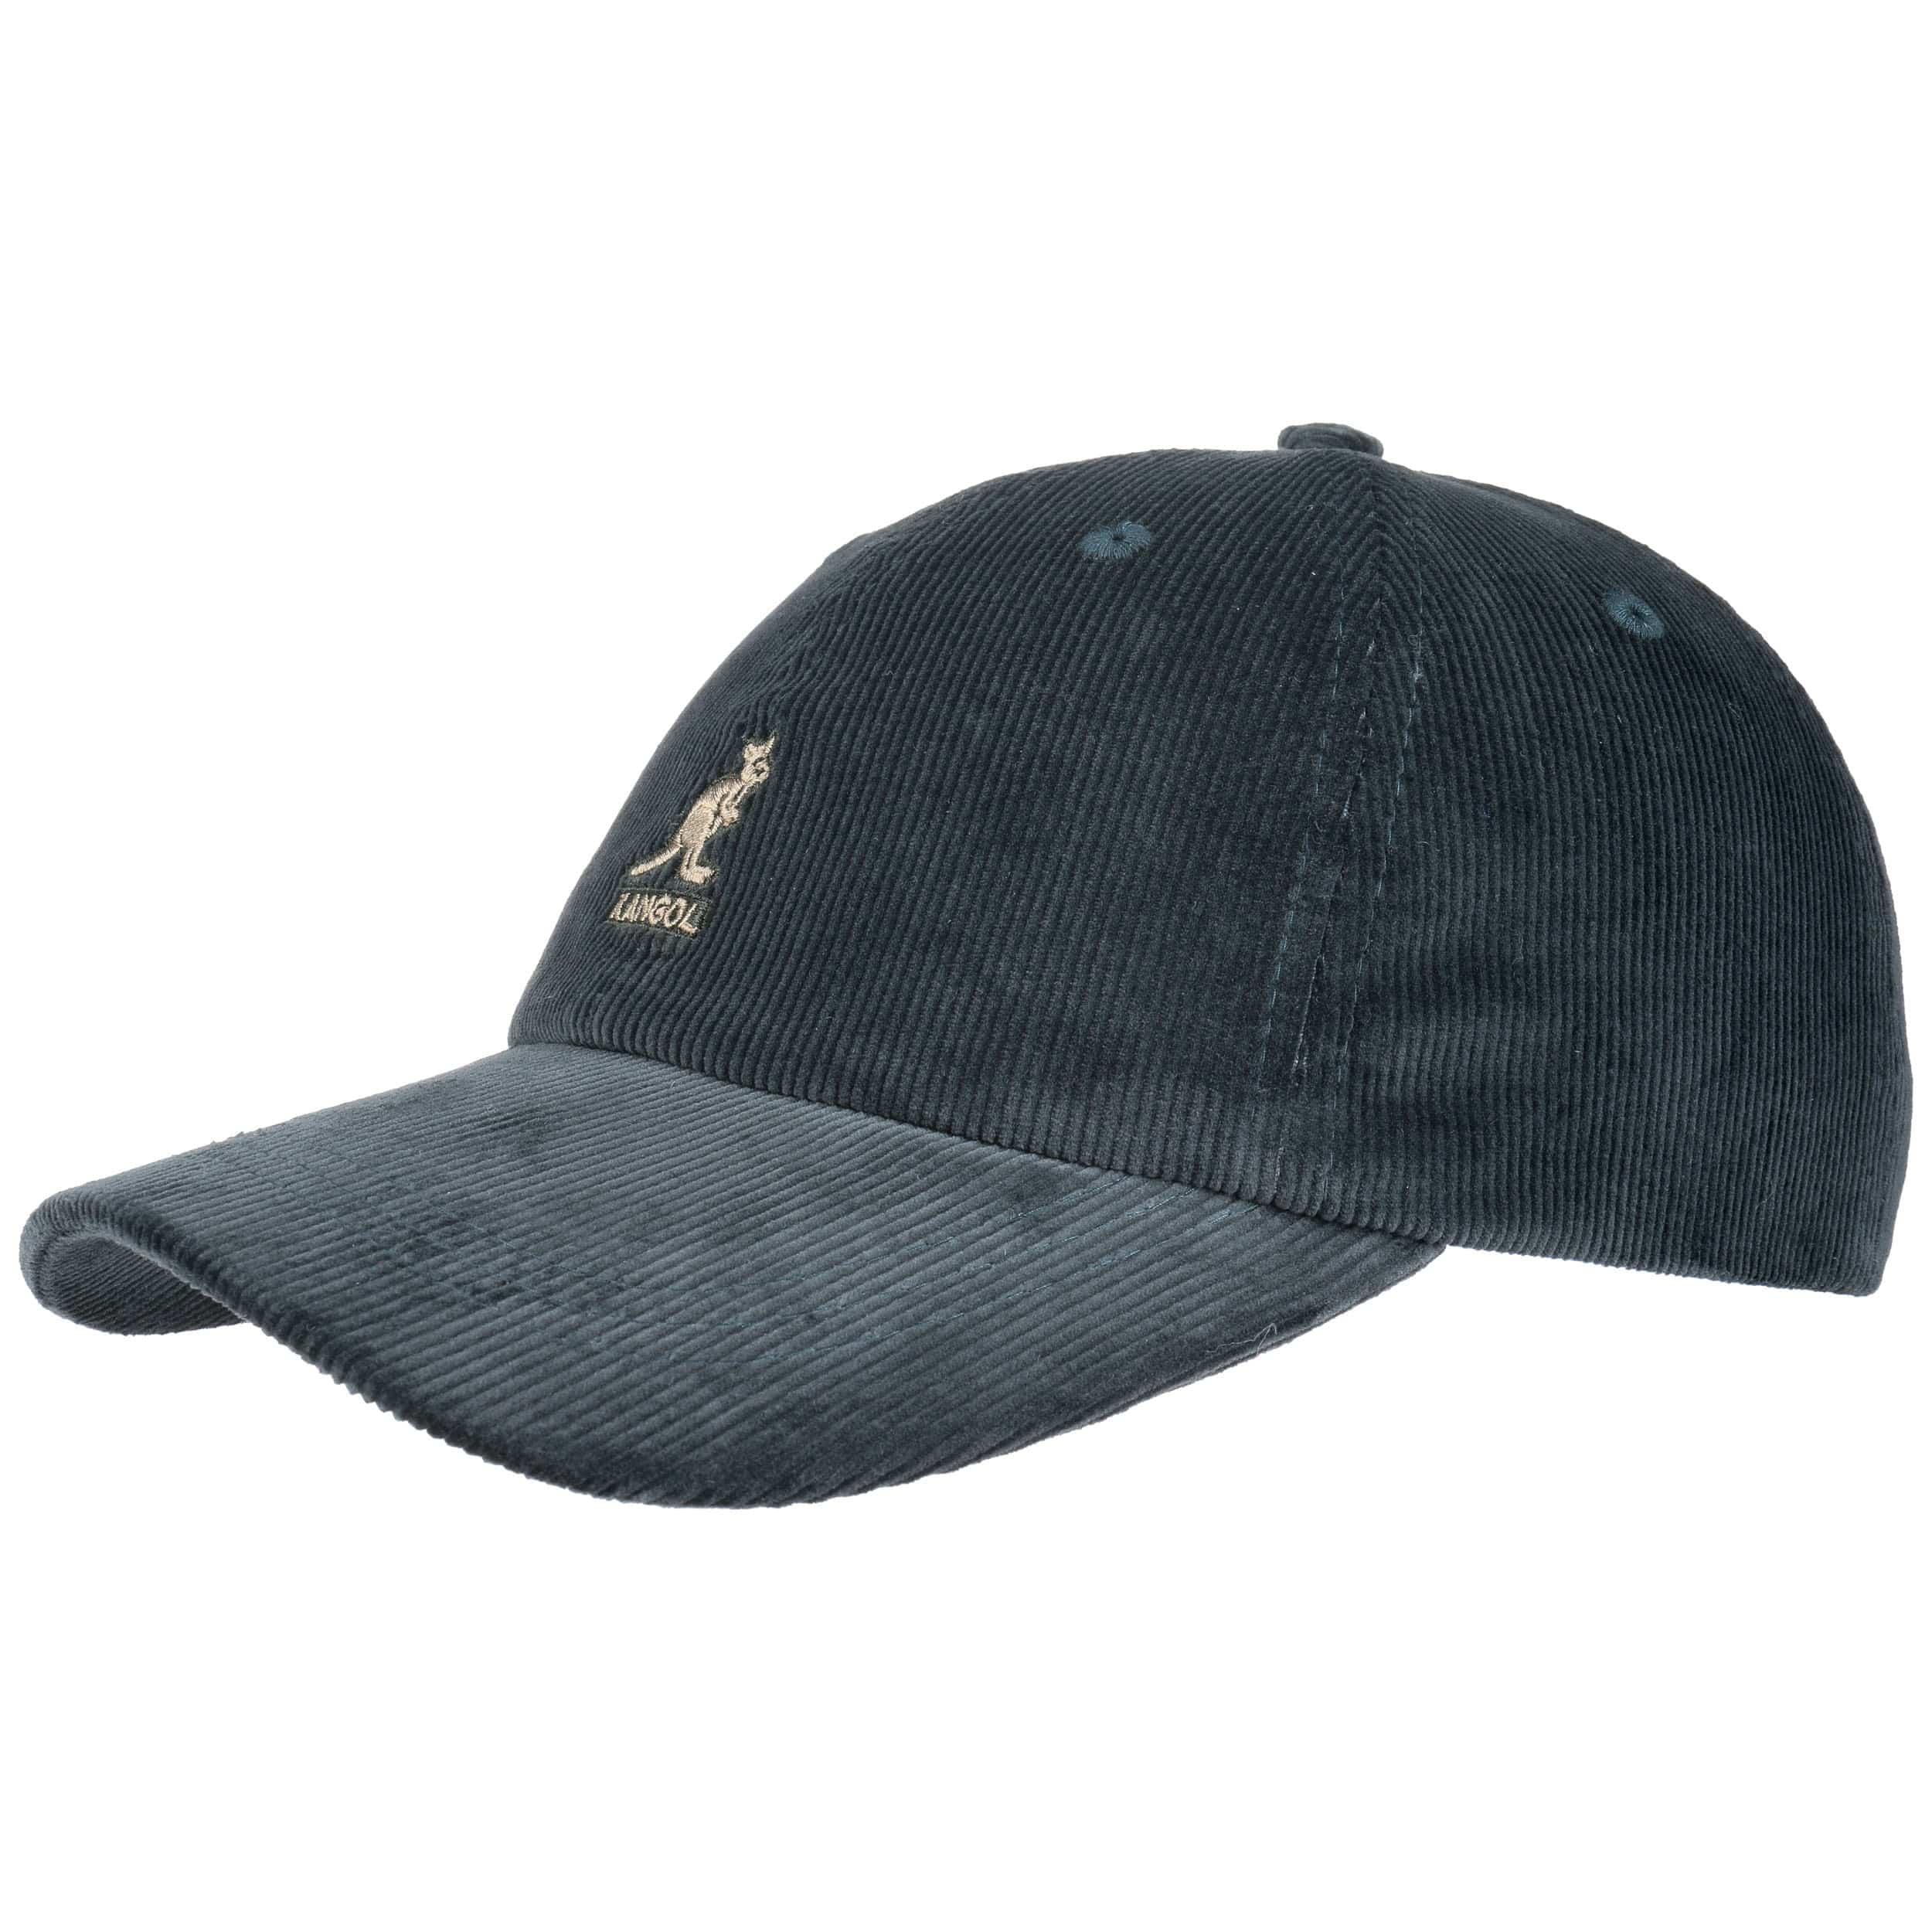 Gorra Classic Corduroy by Kangol - Gorras - sombreroshop.es c52abb1f236